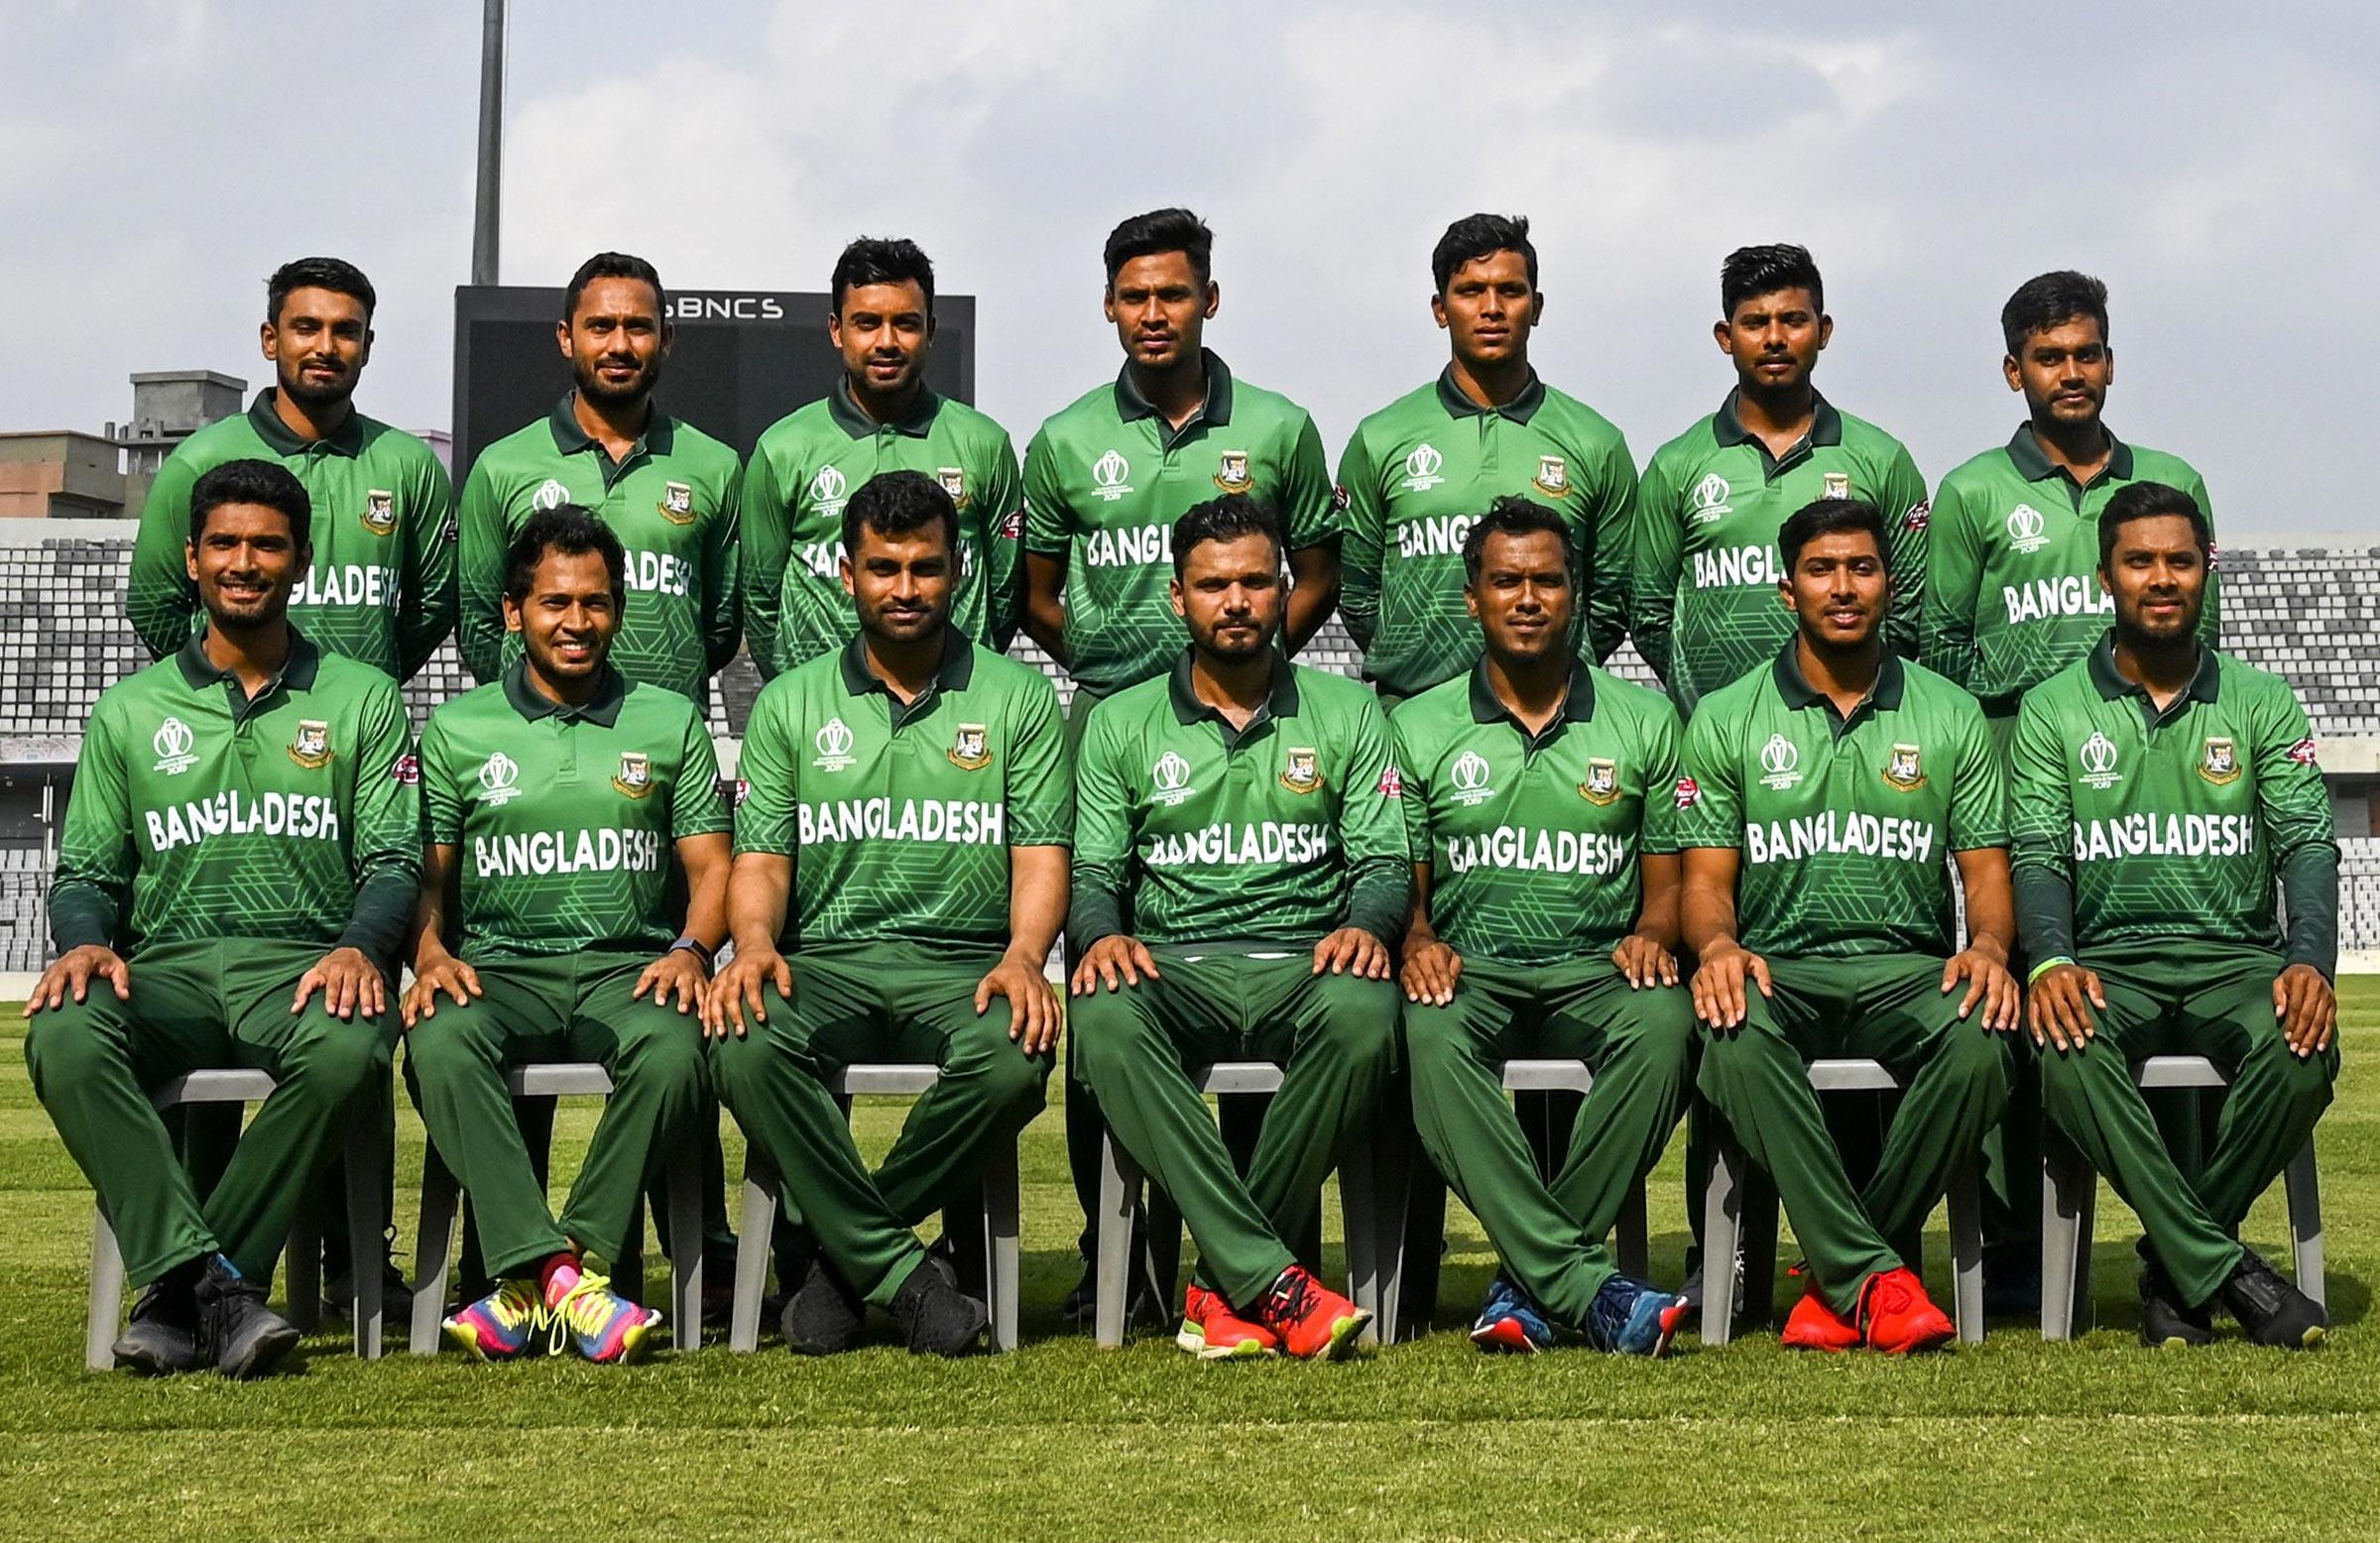 Bangladeshi Cricket Team Teams Background 4